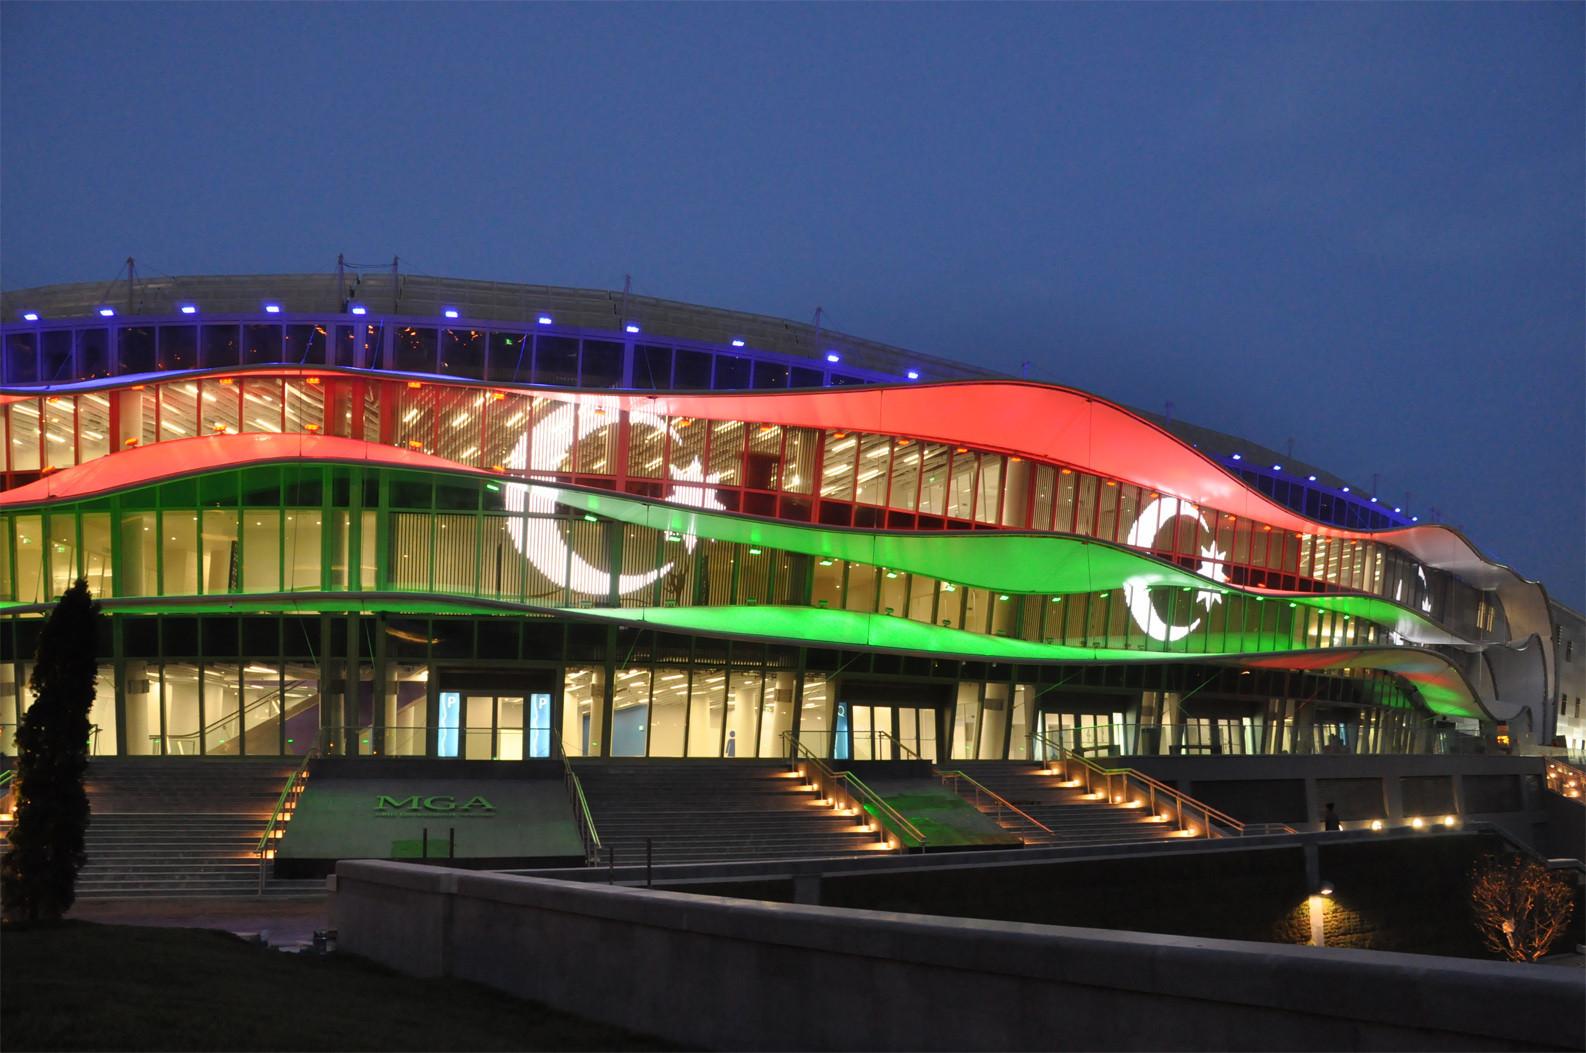 The 2019 Aerobic Gymnastics European Championships are taking place at Baku's National Gymnastics Arena ©Wikipedia